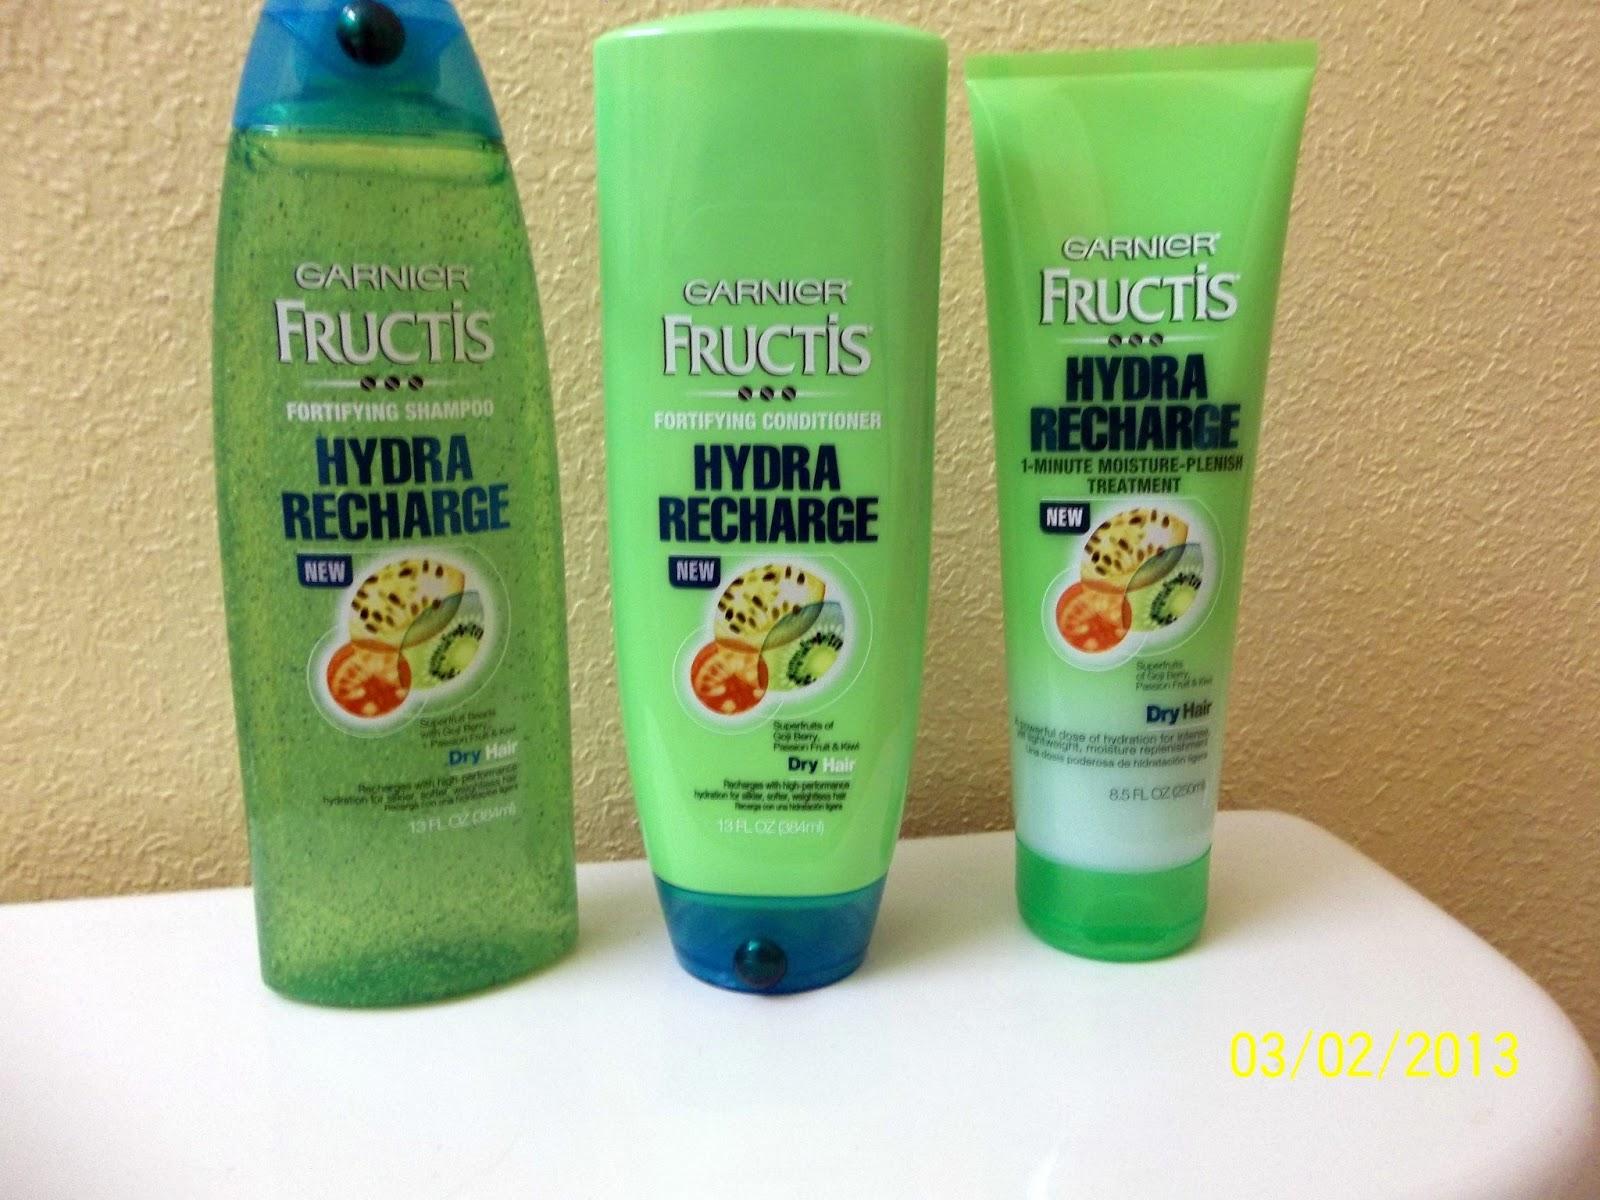 Garnier Fructis Hydra Recharge Conditioner Natural Hair